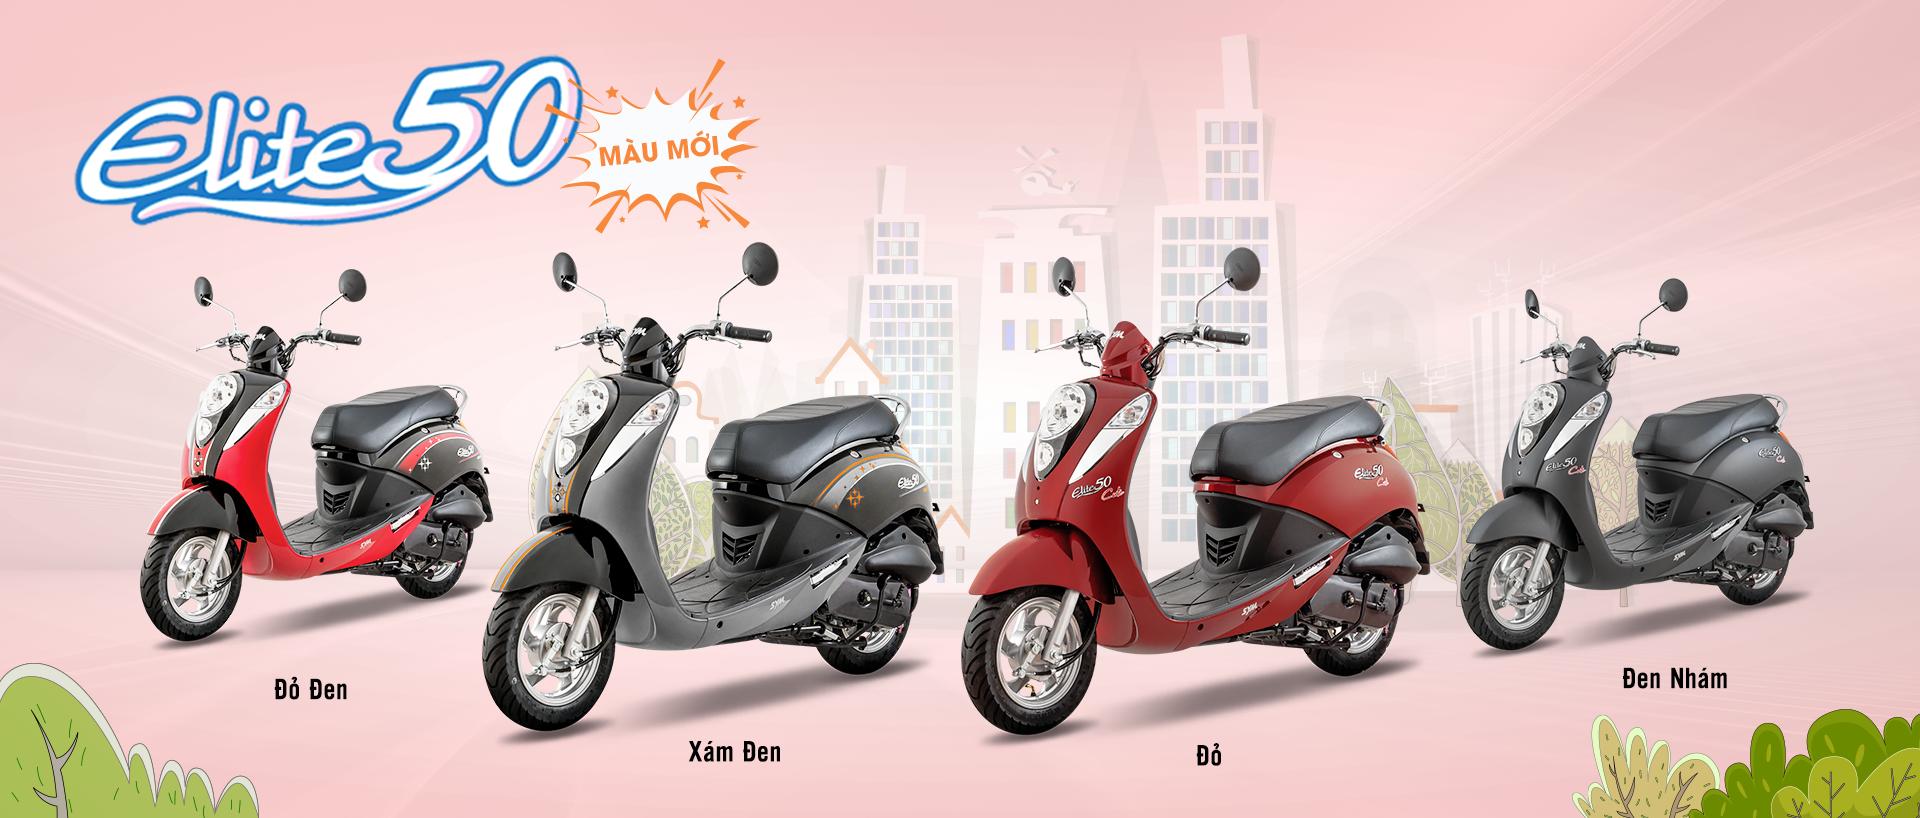 Giá xe máy 50cc Elite Sym